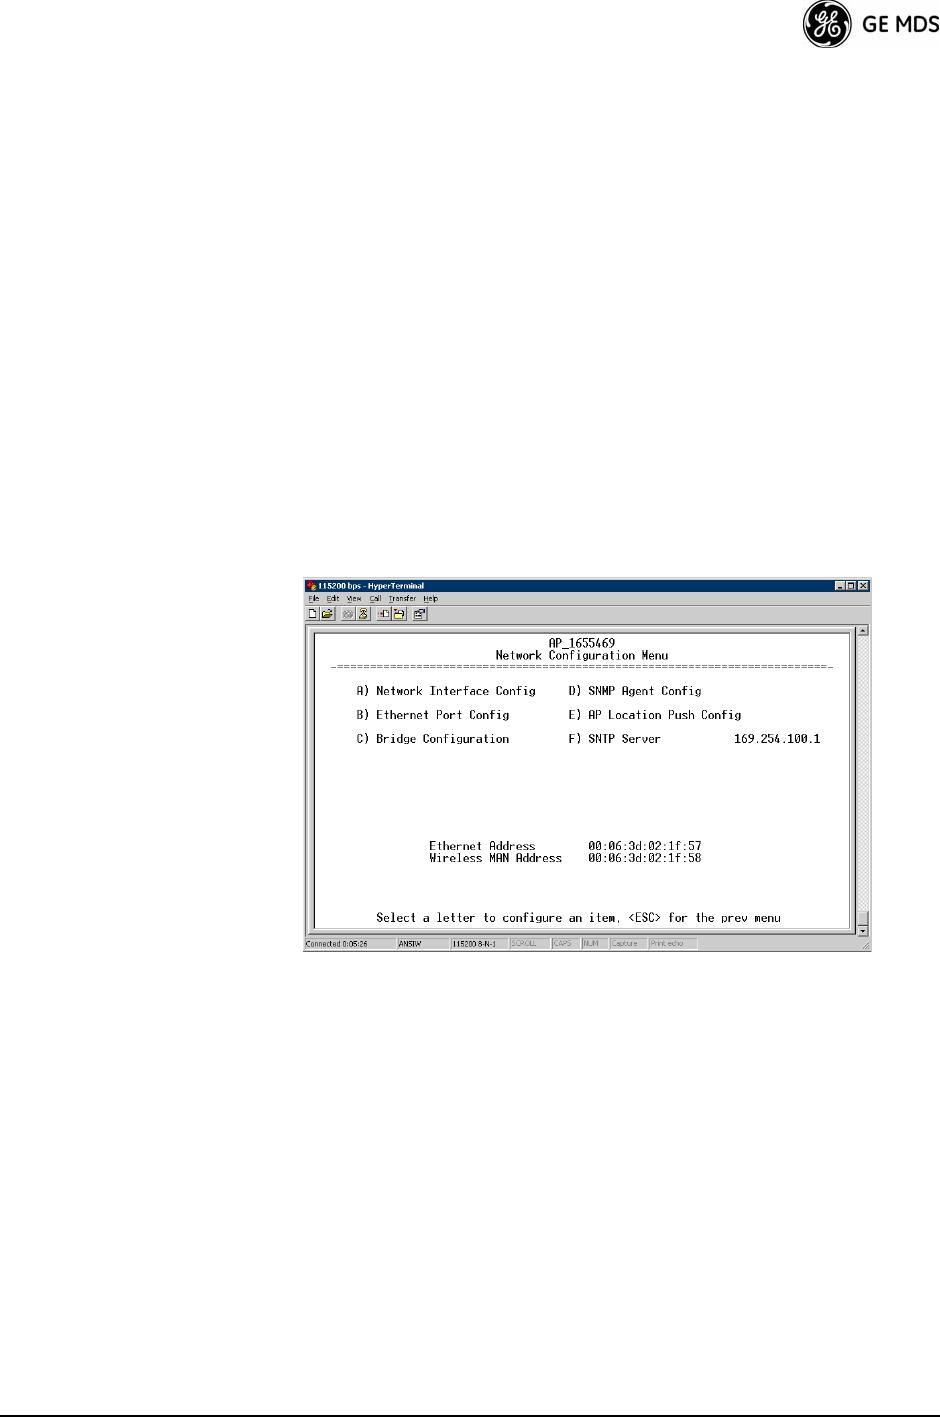 GE MDS DS-MERCURY3650 Wireless IP/Ethernet Transceiver